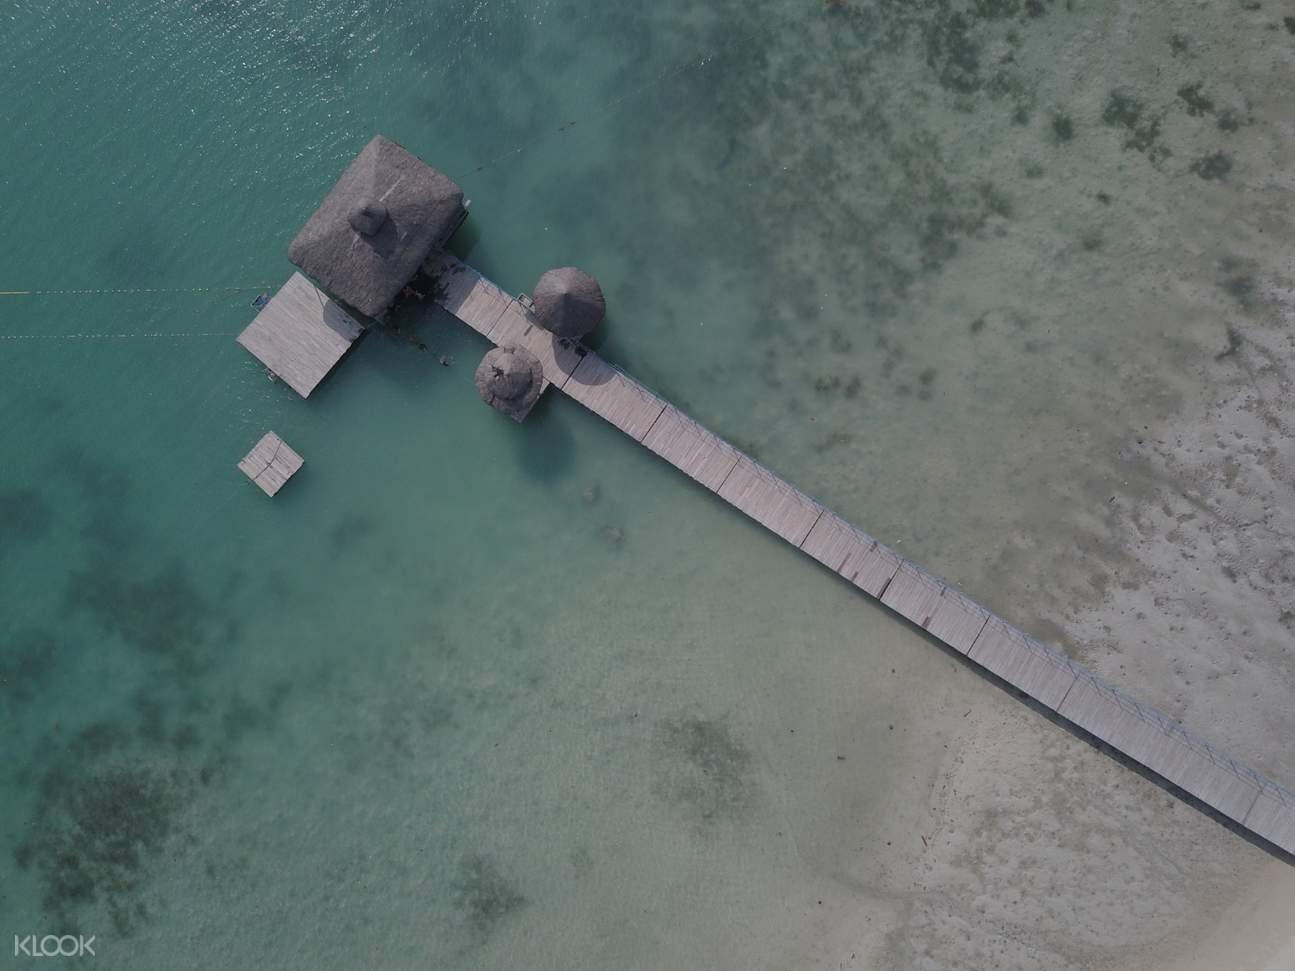 samal island pier from above